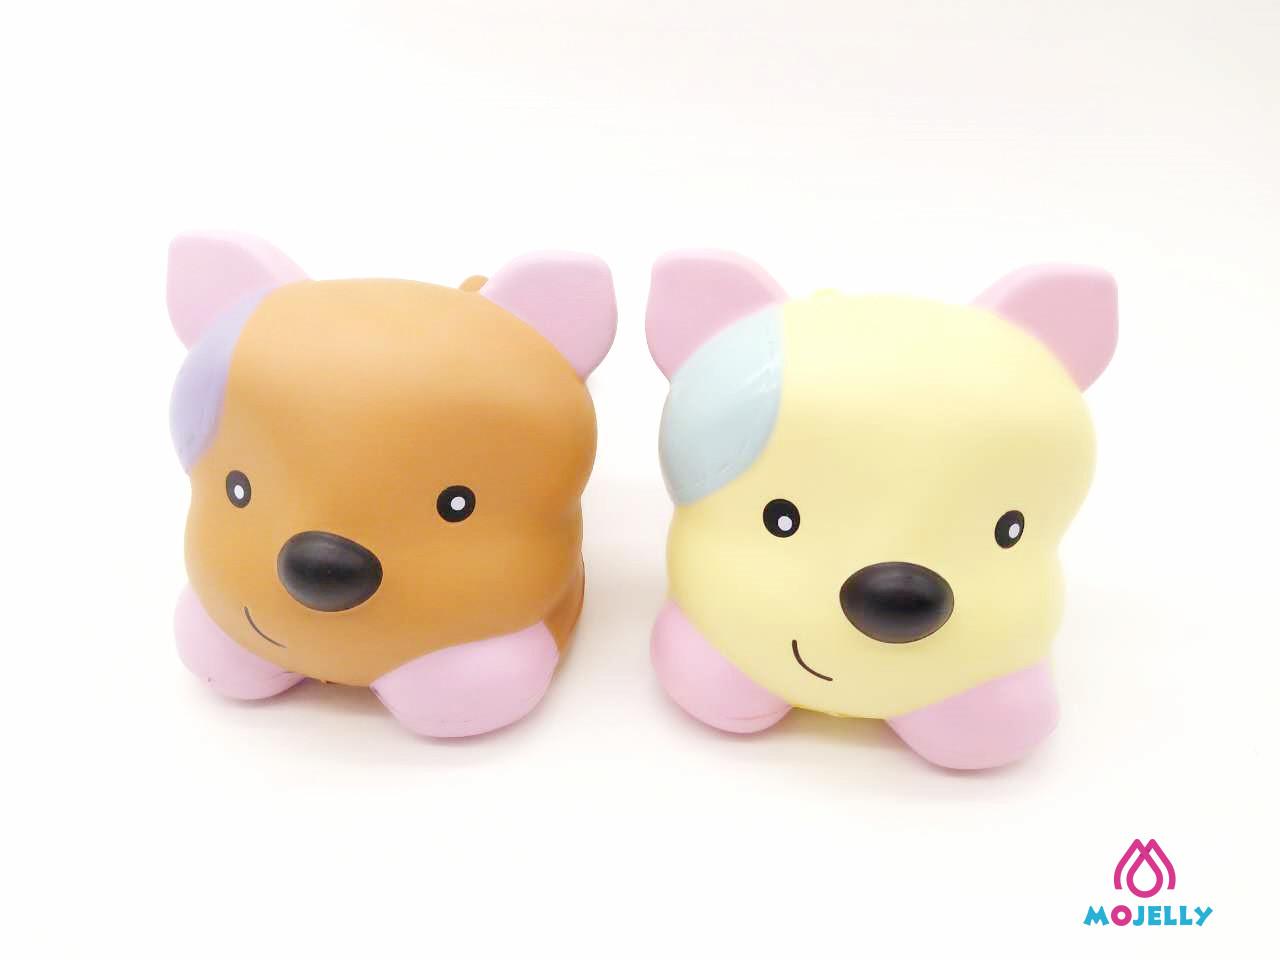 Mojelly – Puppy